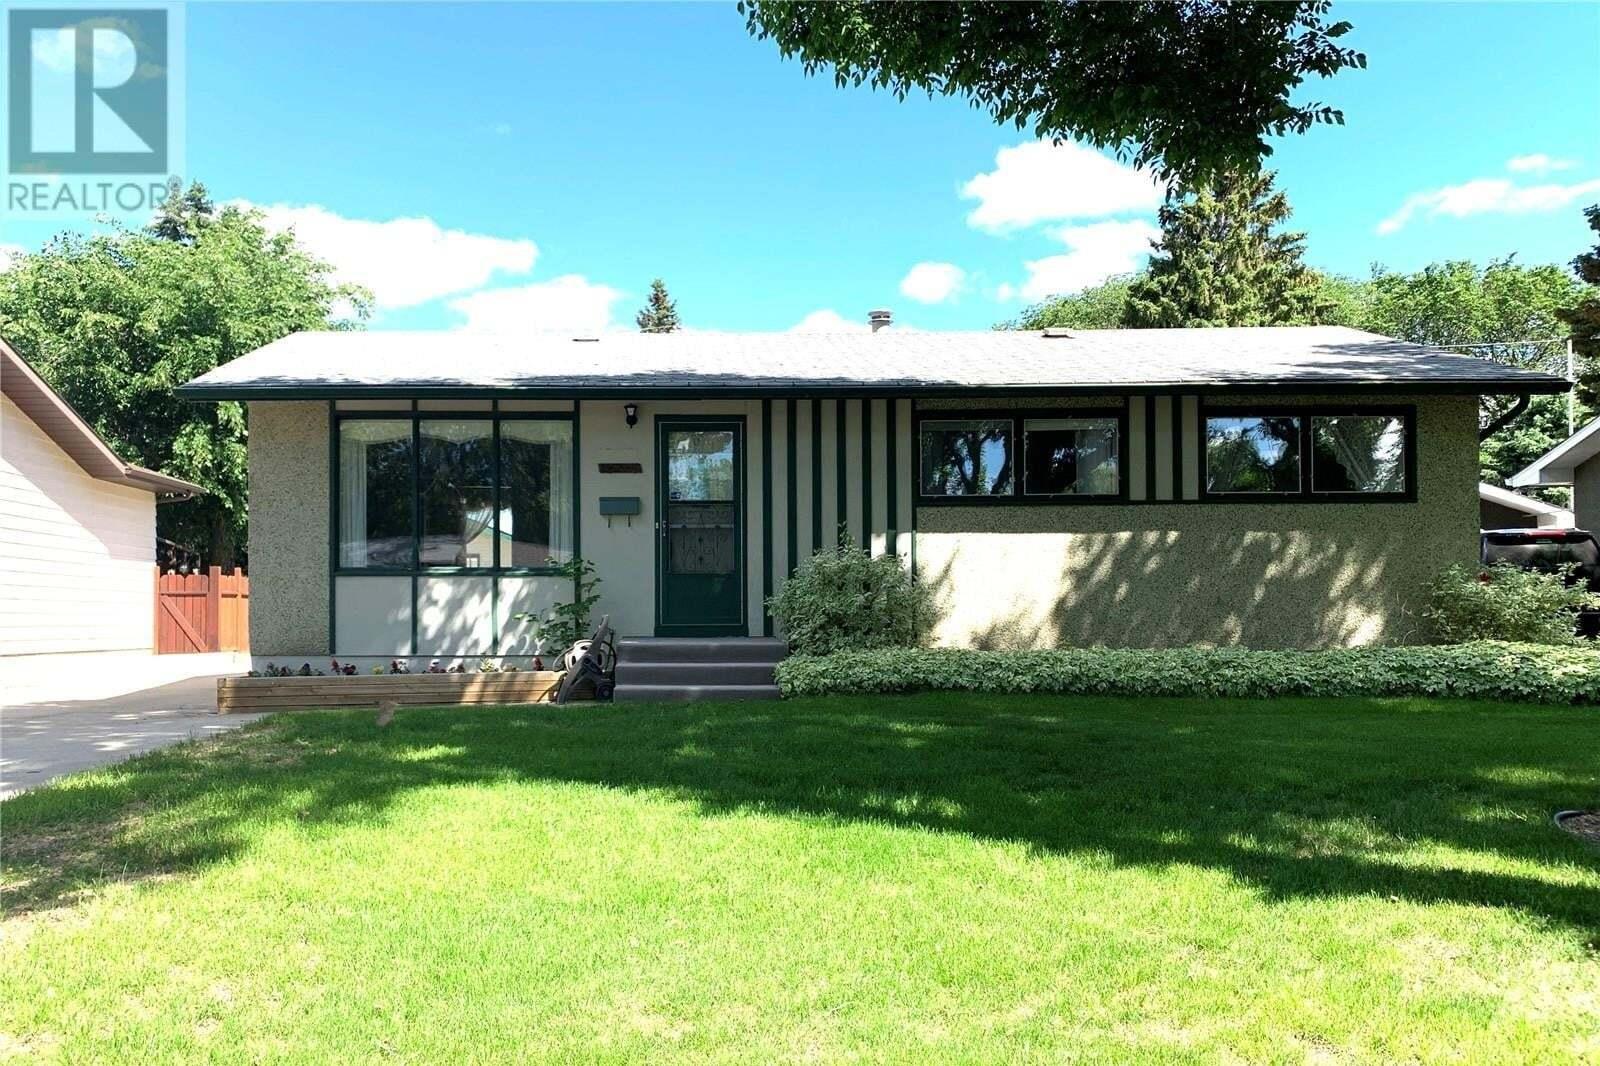 House for sale at 1962 96th St North Battleford Saskatchewan - MLS: SK814204